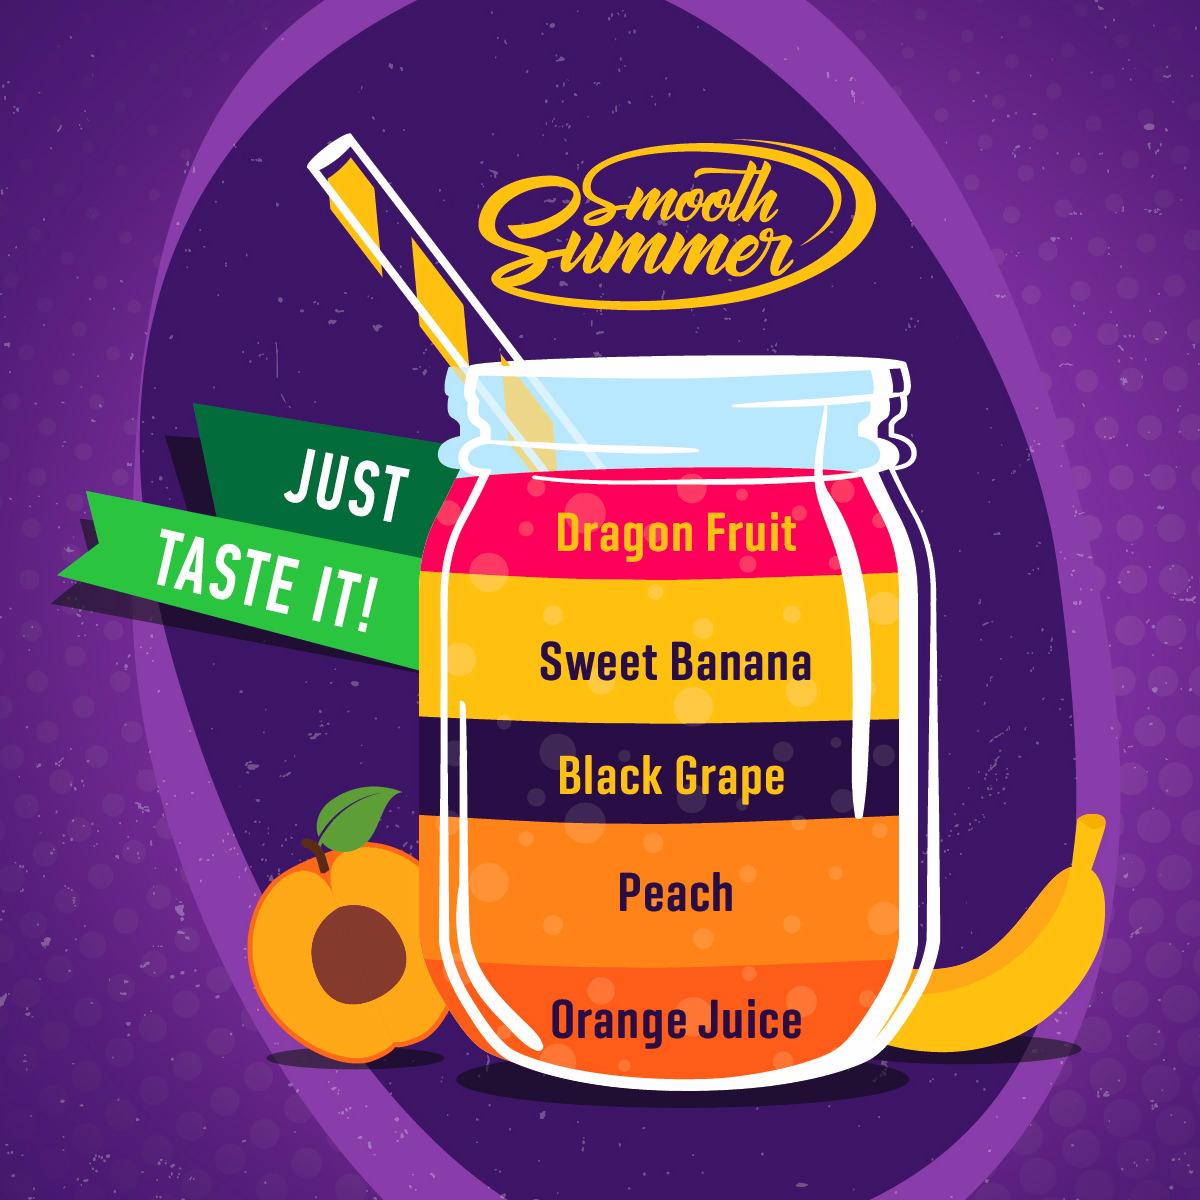 Příchuť Big Mouth Smooth Summer - Hroznové víno a banán